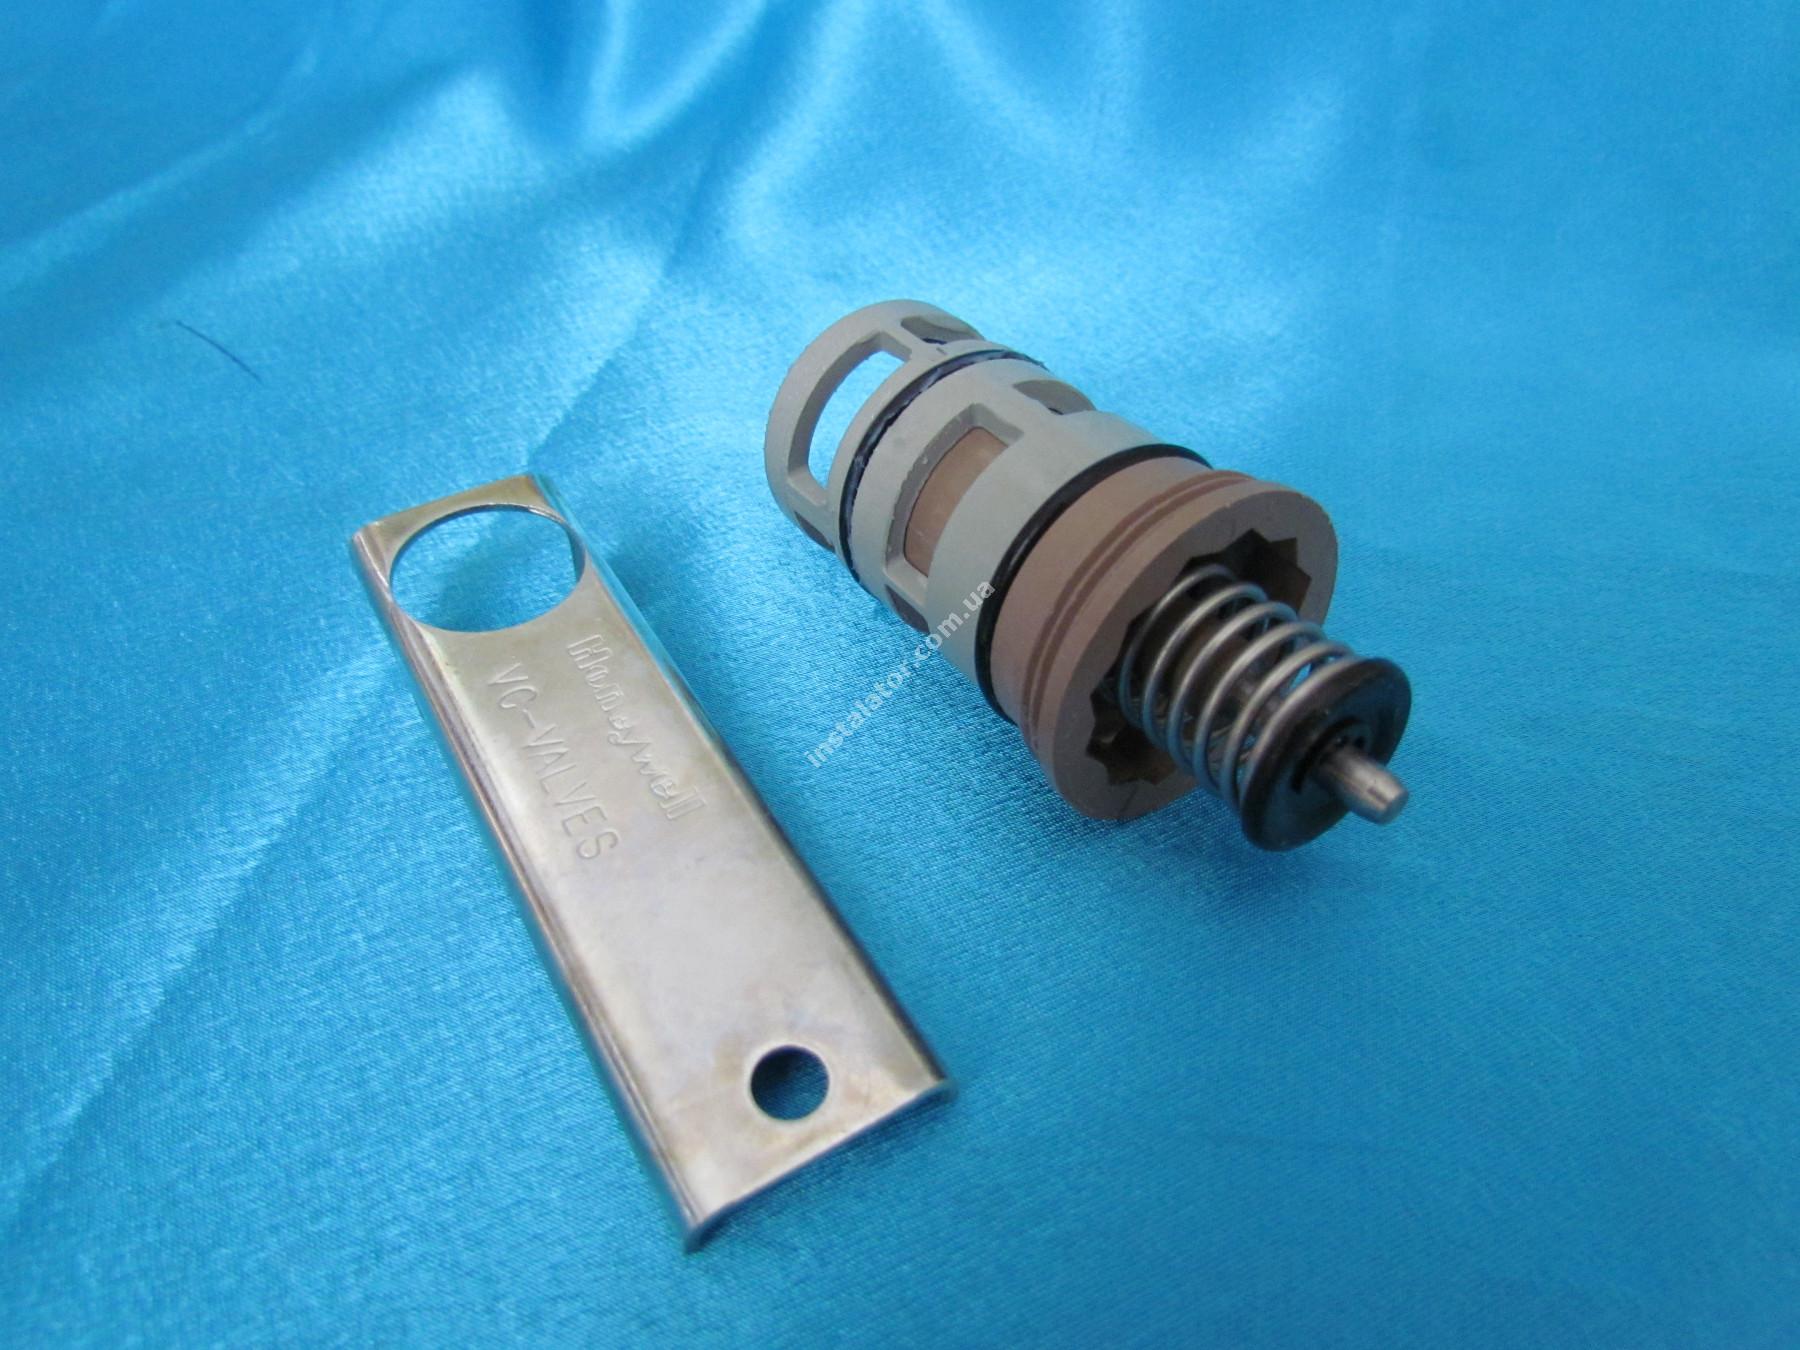 280333 Картридж (патрон) 3-х ходового клапана (22мм) Honeywell VCZZ6000/U full-image-1